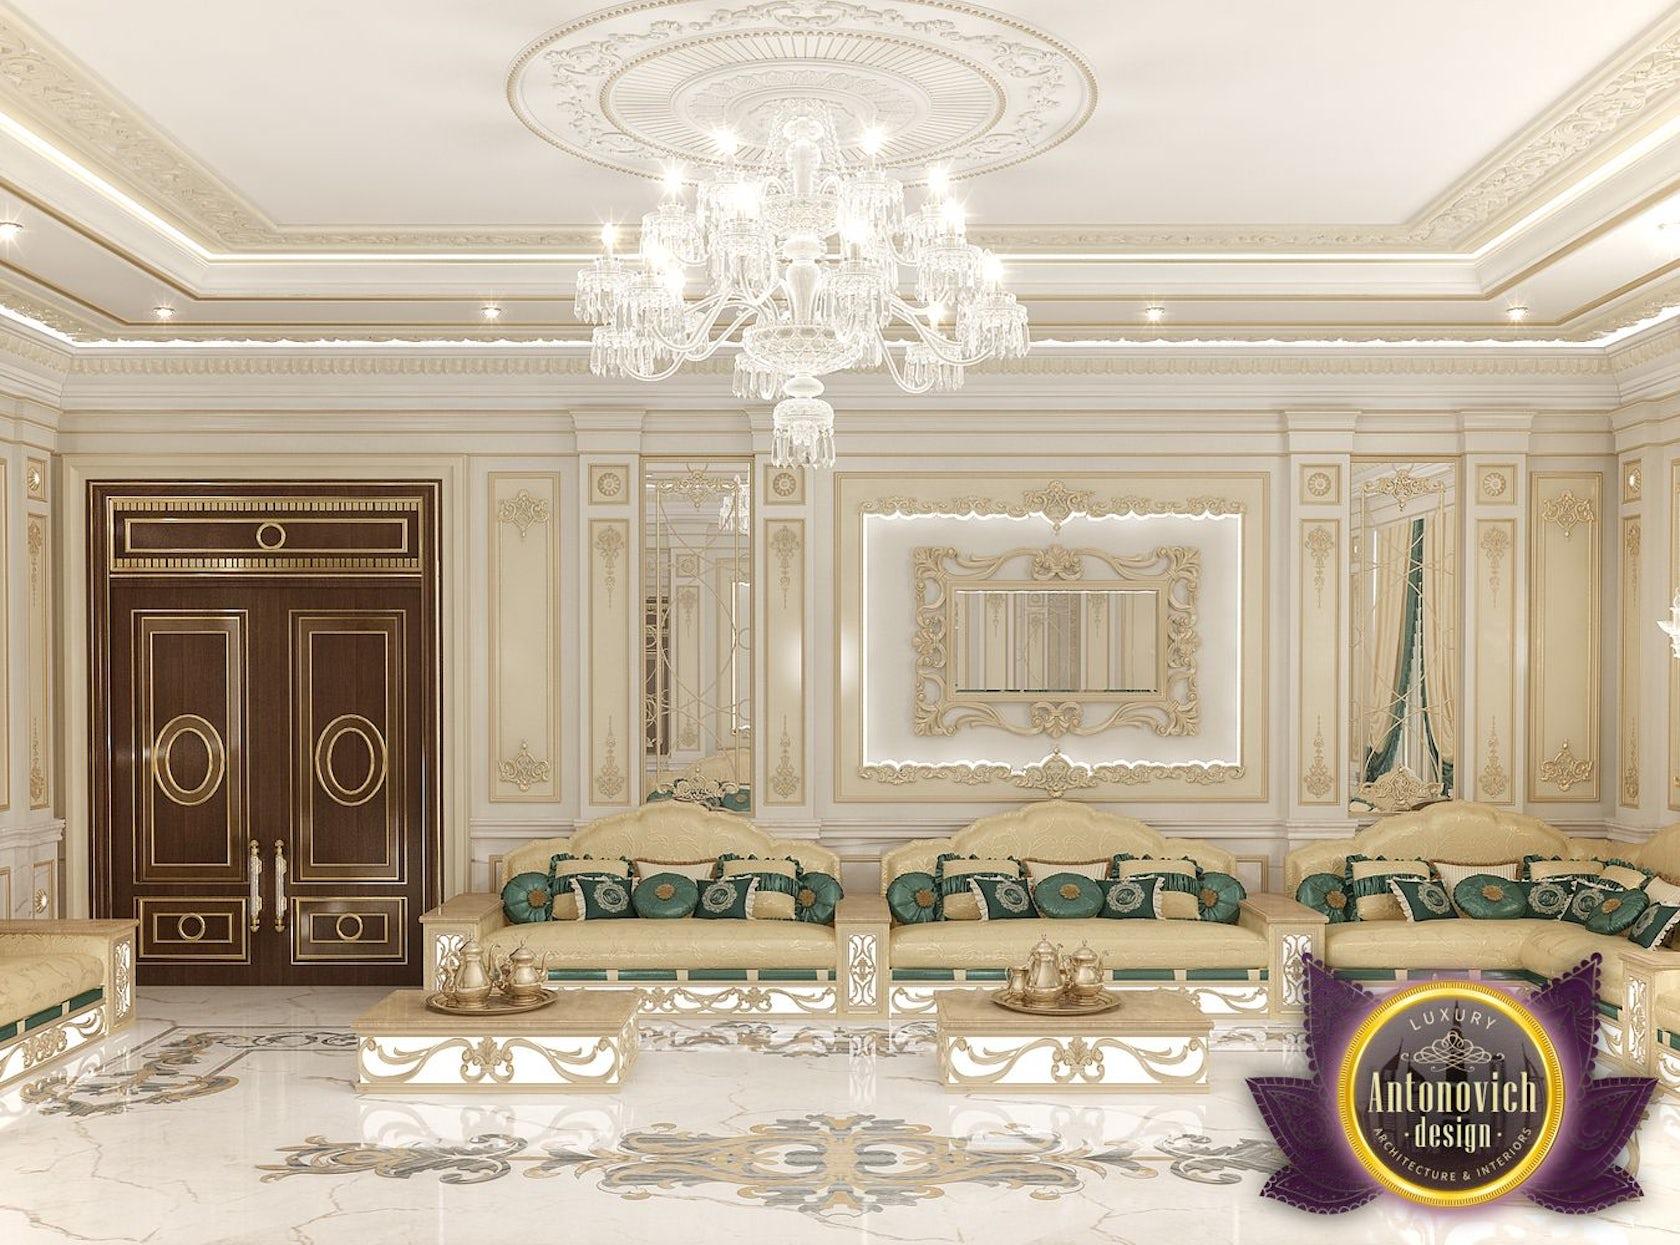 Arabic Majlis Interior Design from Luxury Antonovich Design on Architizer